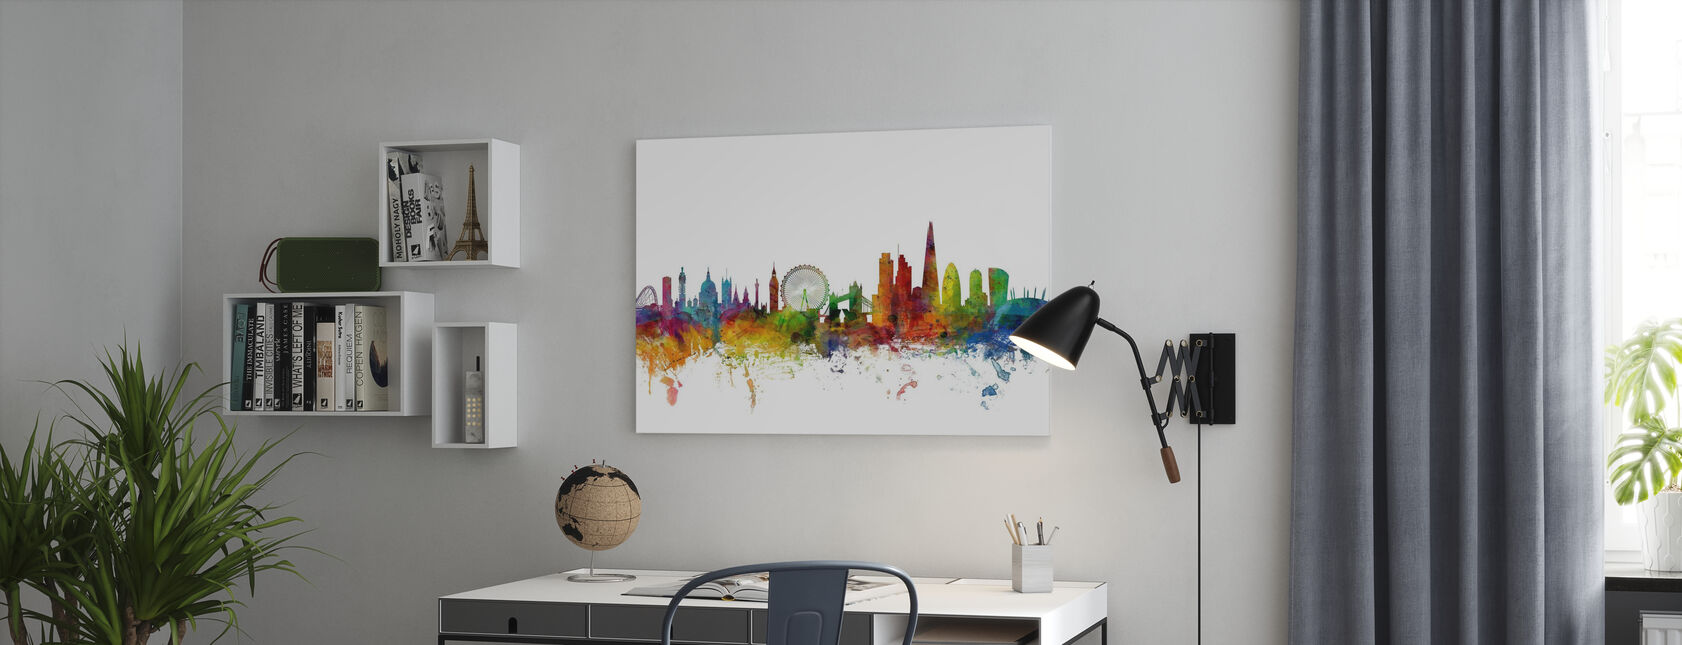 London Skyline 2 - Canvastavla - Kontor